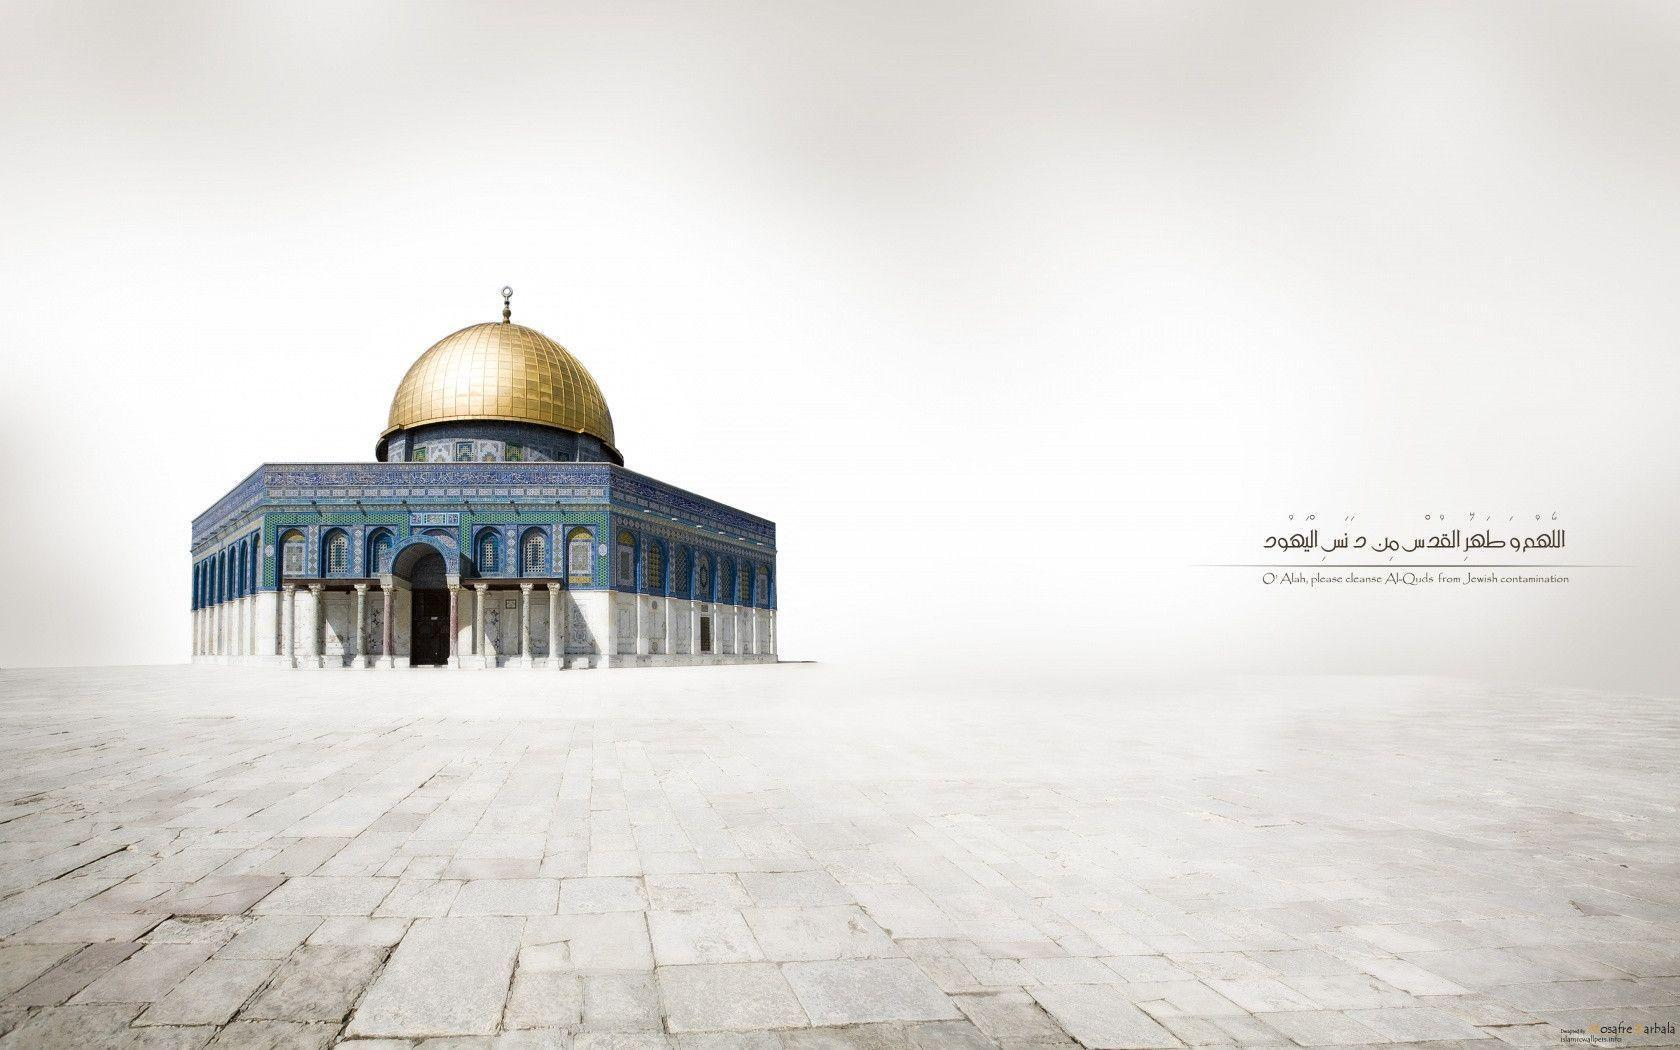 Al-Quds Brigades - Wikipedia